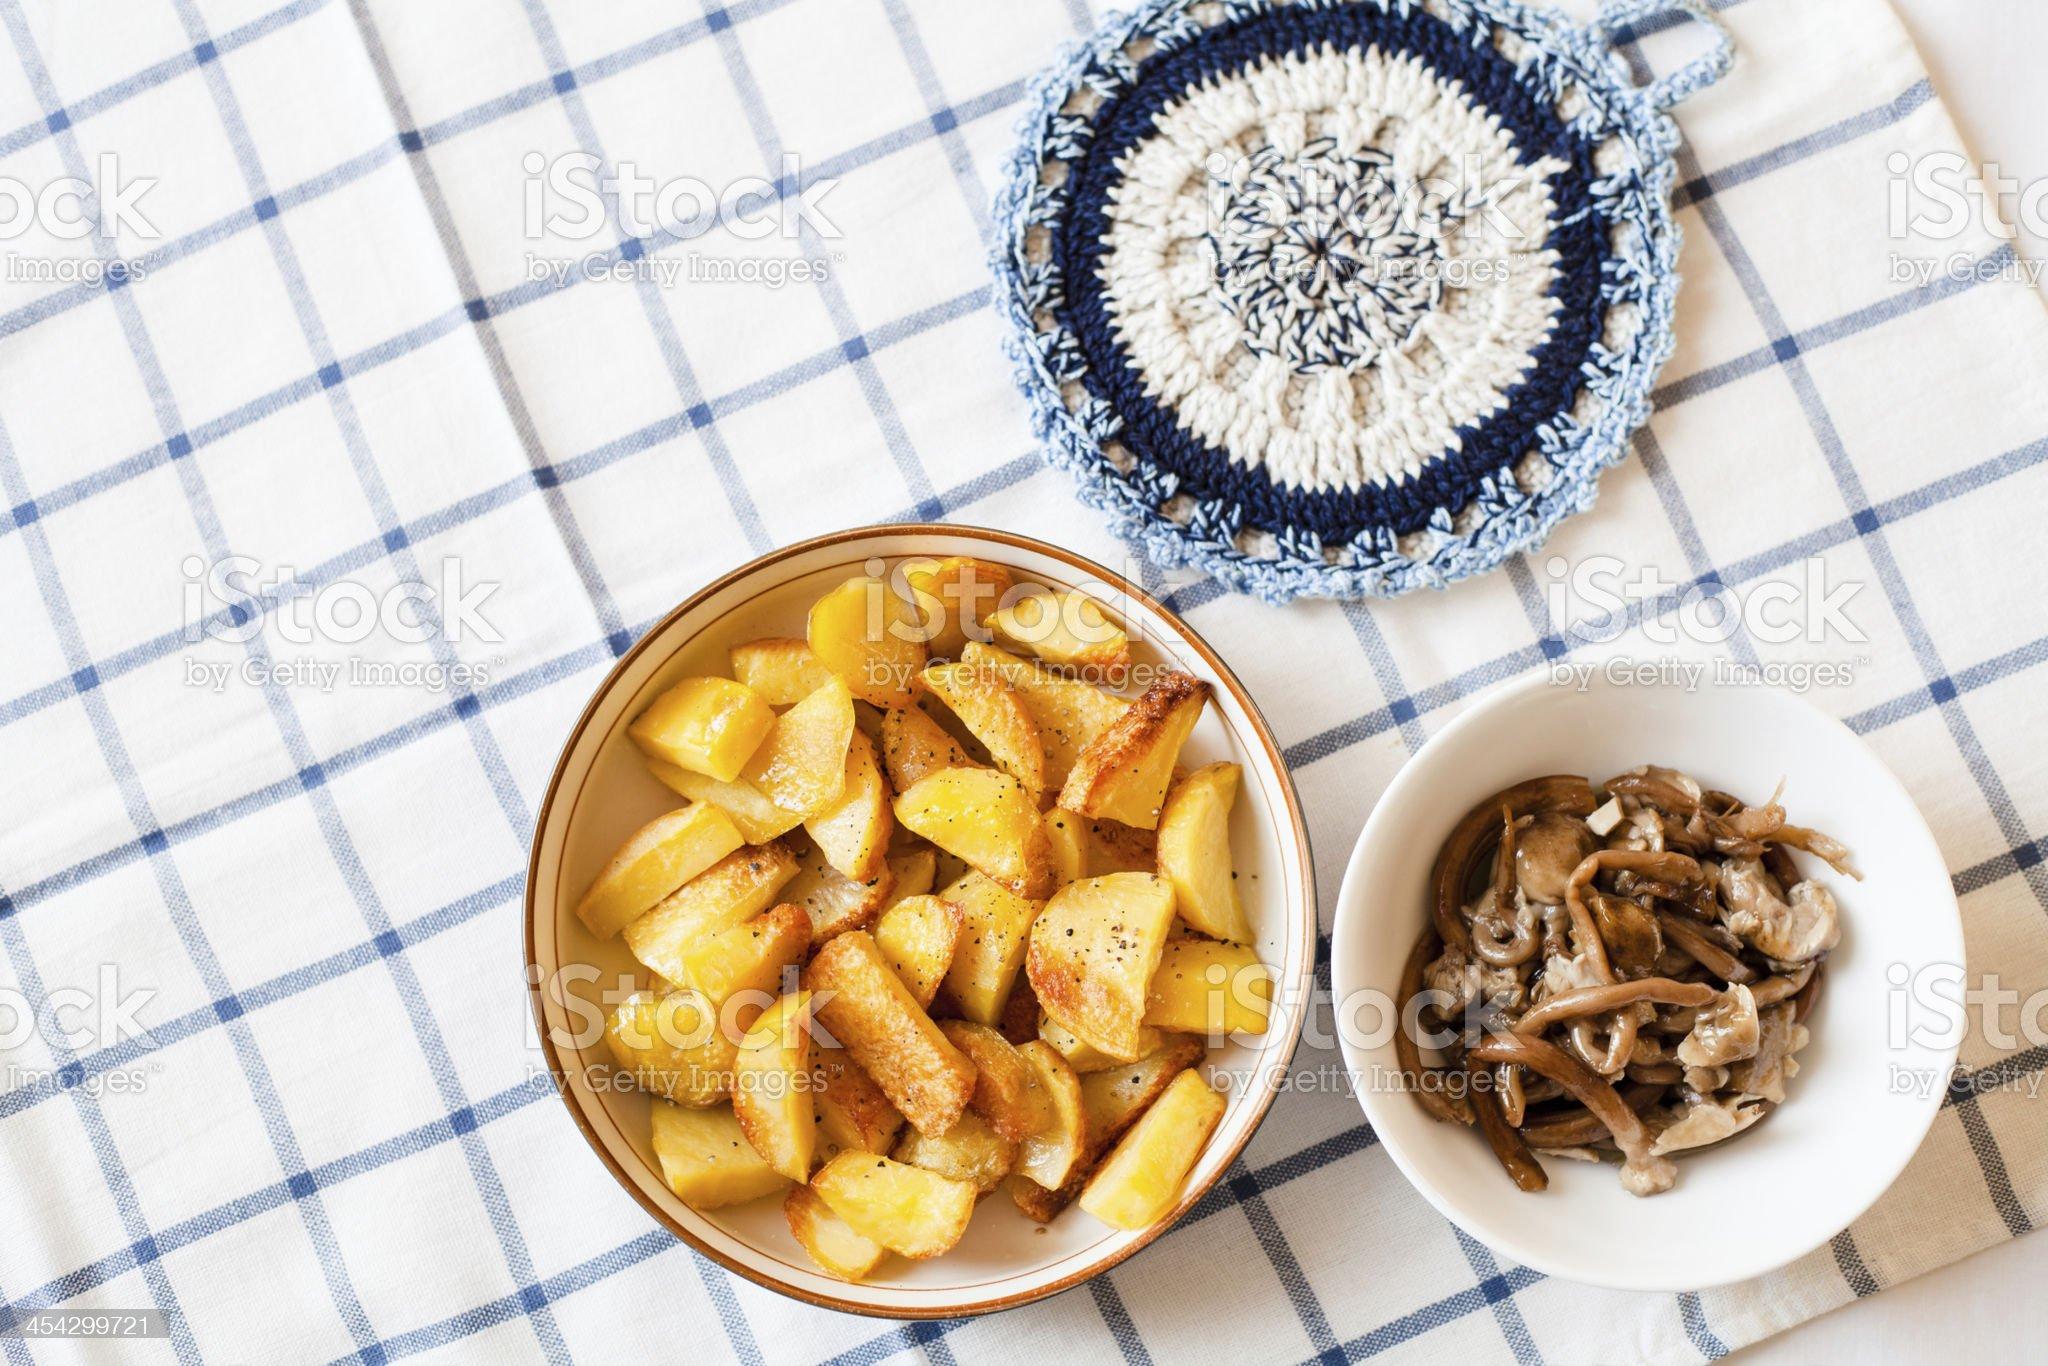 Baked Potatoes and Mushrooms royalty-free stock photo